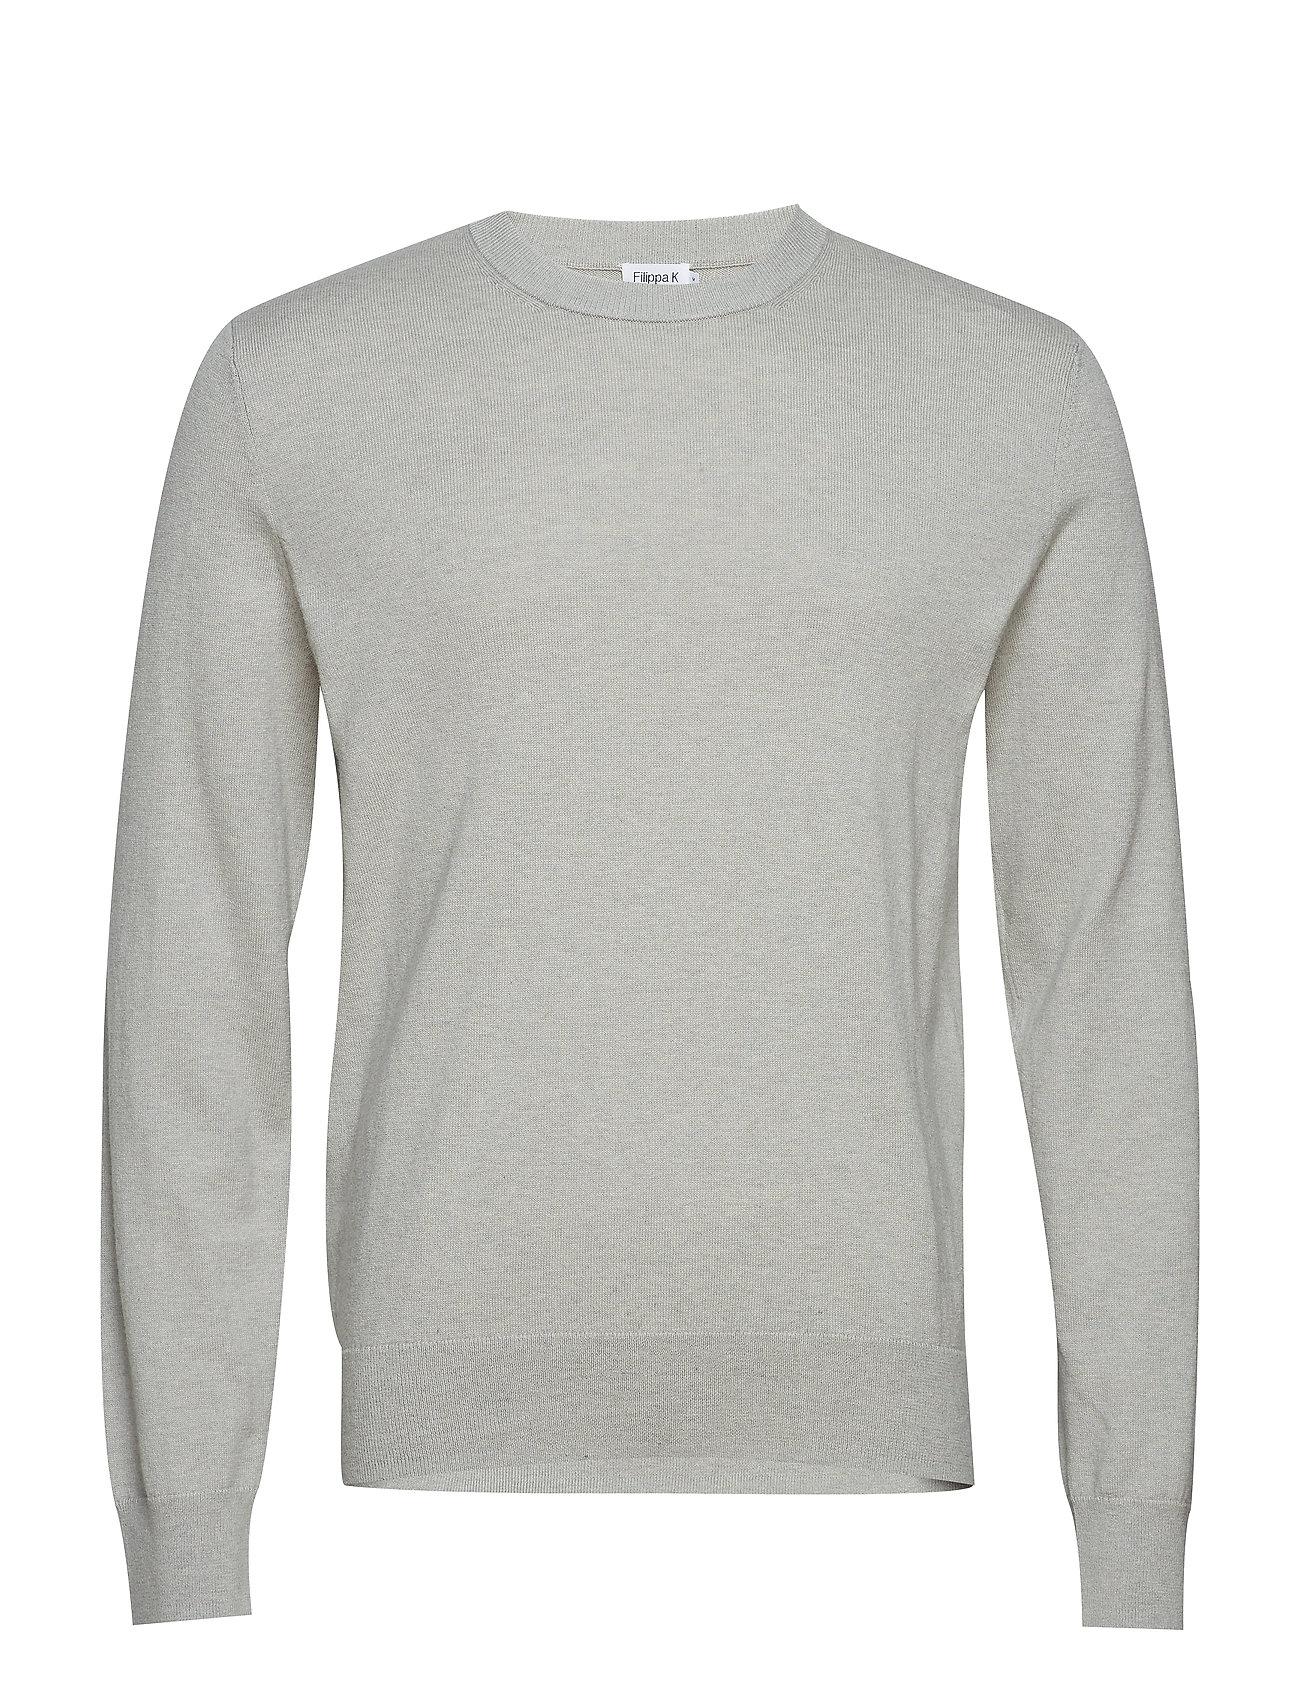 Filippa K M. Cotton Merino Basic Sweater - LIMESTONE